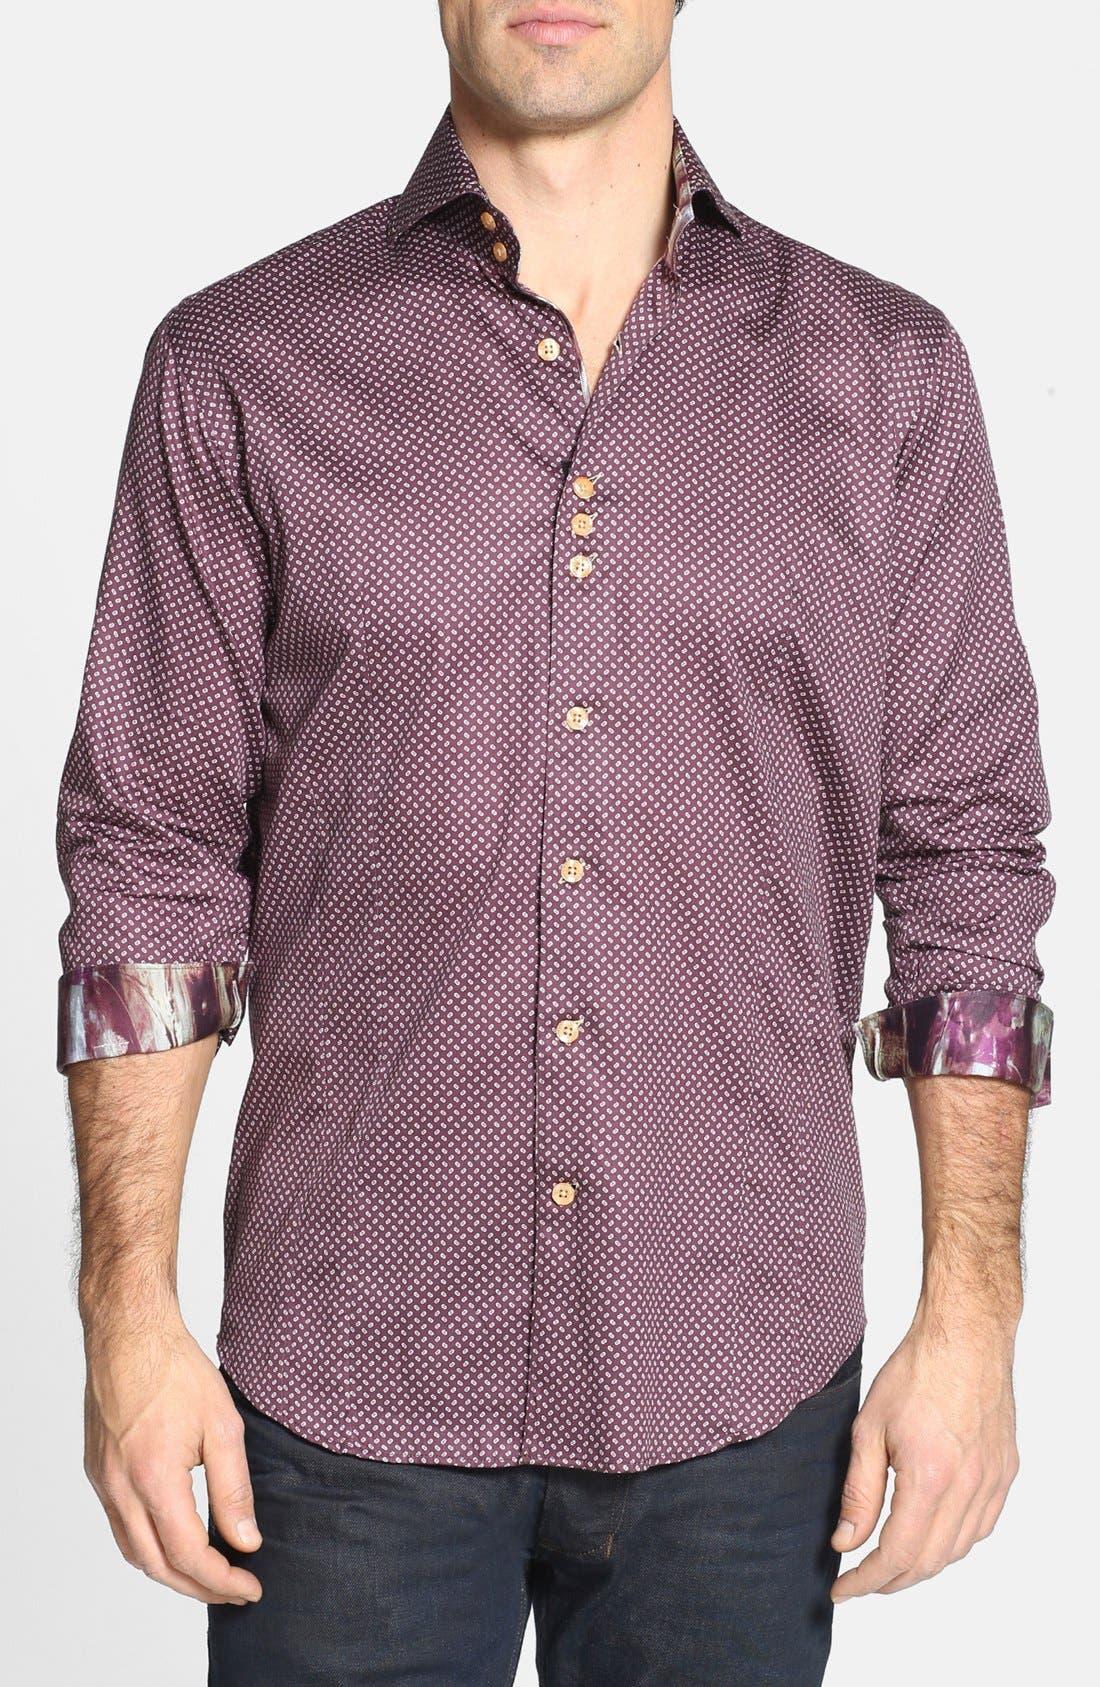 Alternate Image 1 Selected - Bogosse 'D-Rey' Trim Fit Sport Shirt